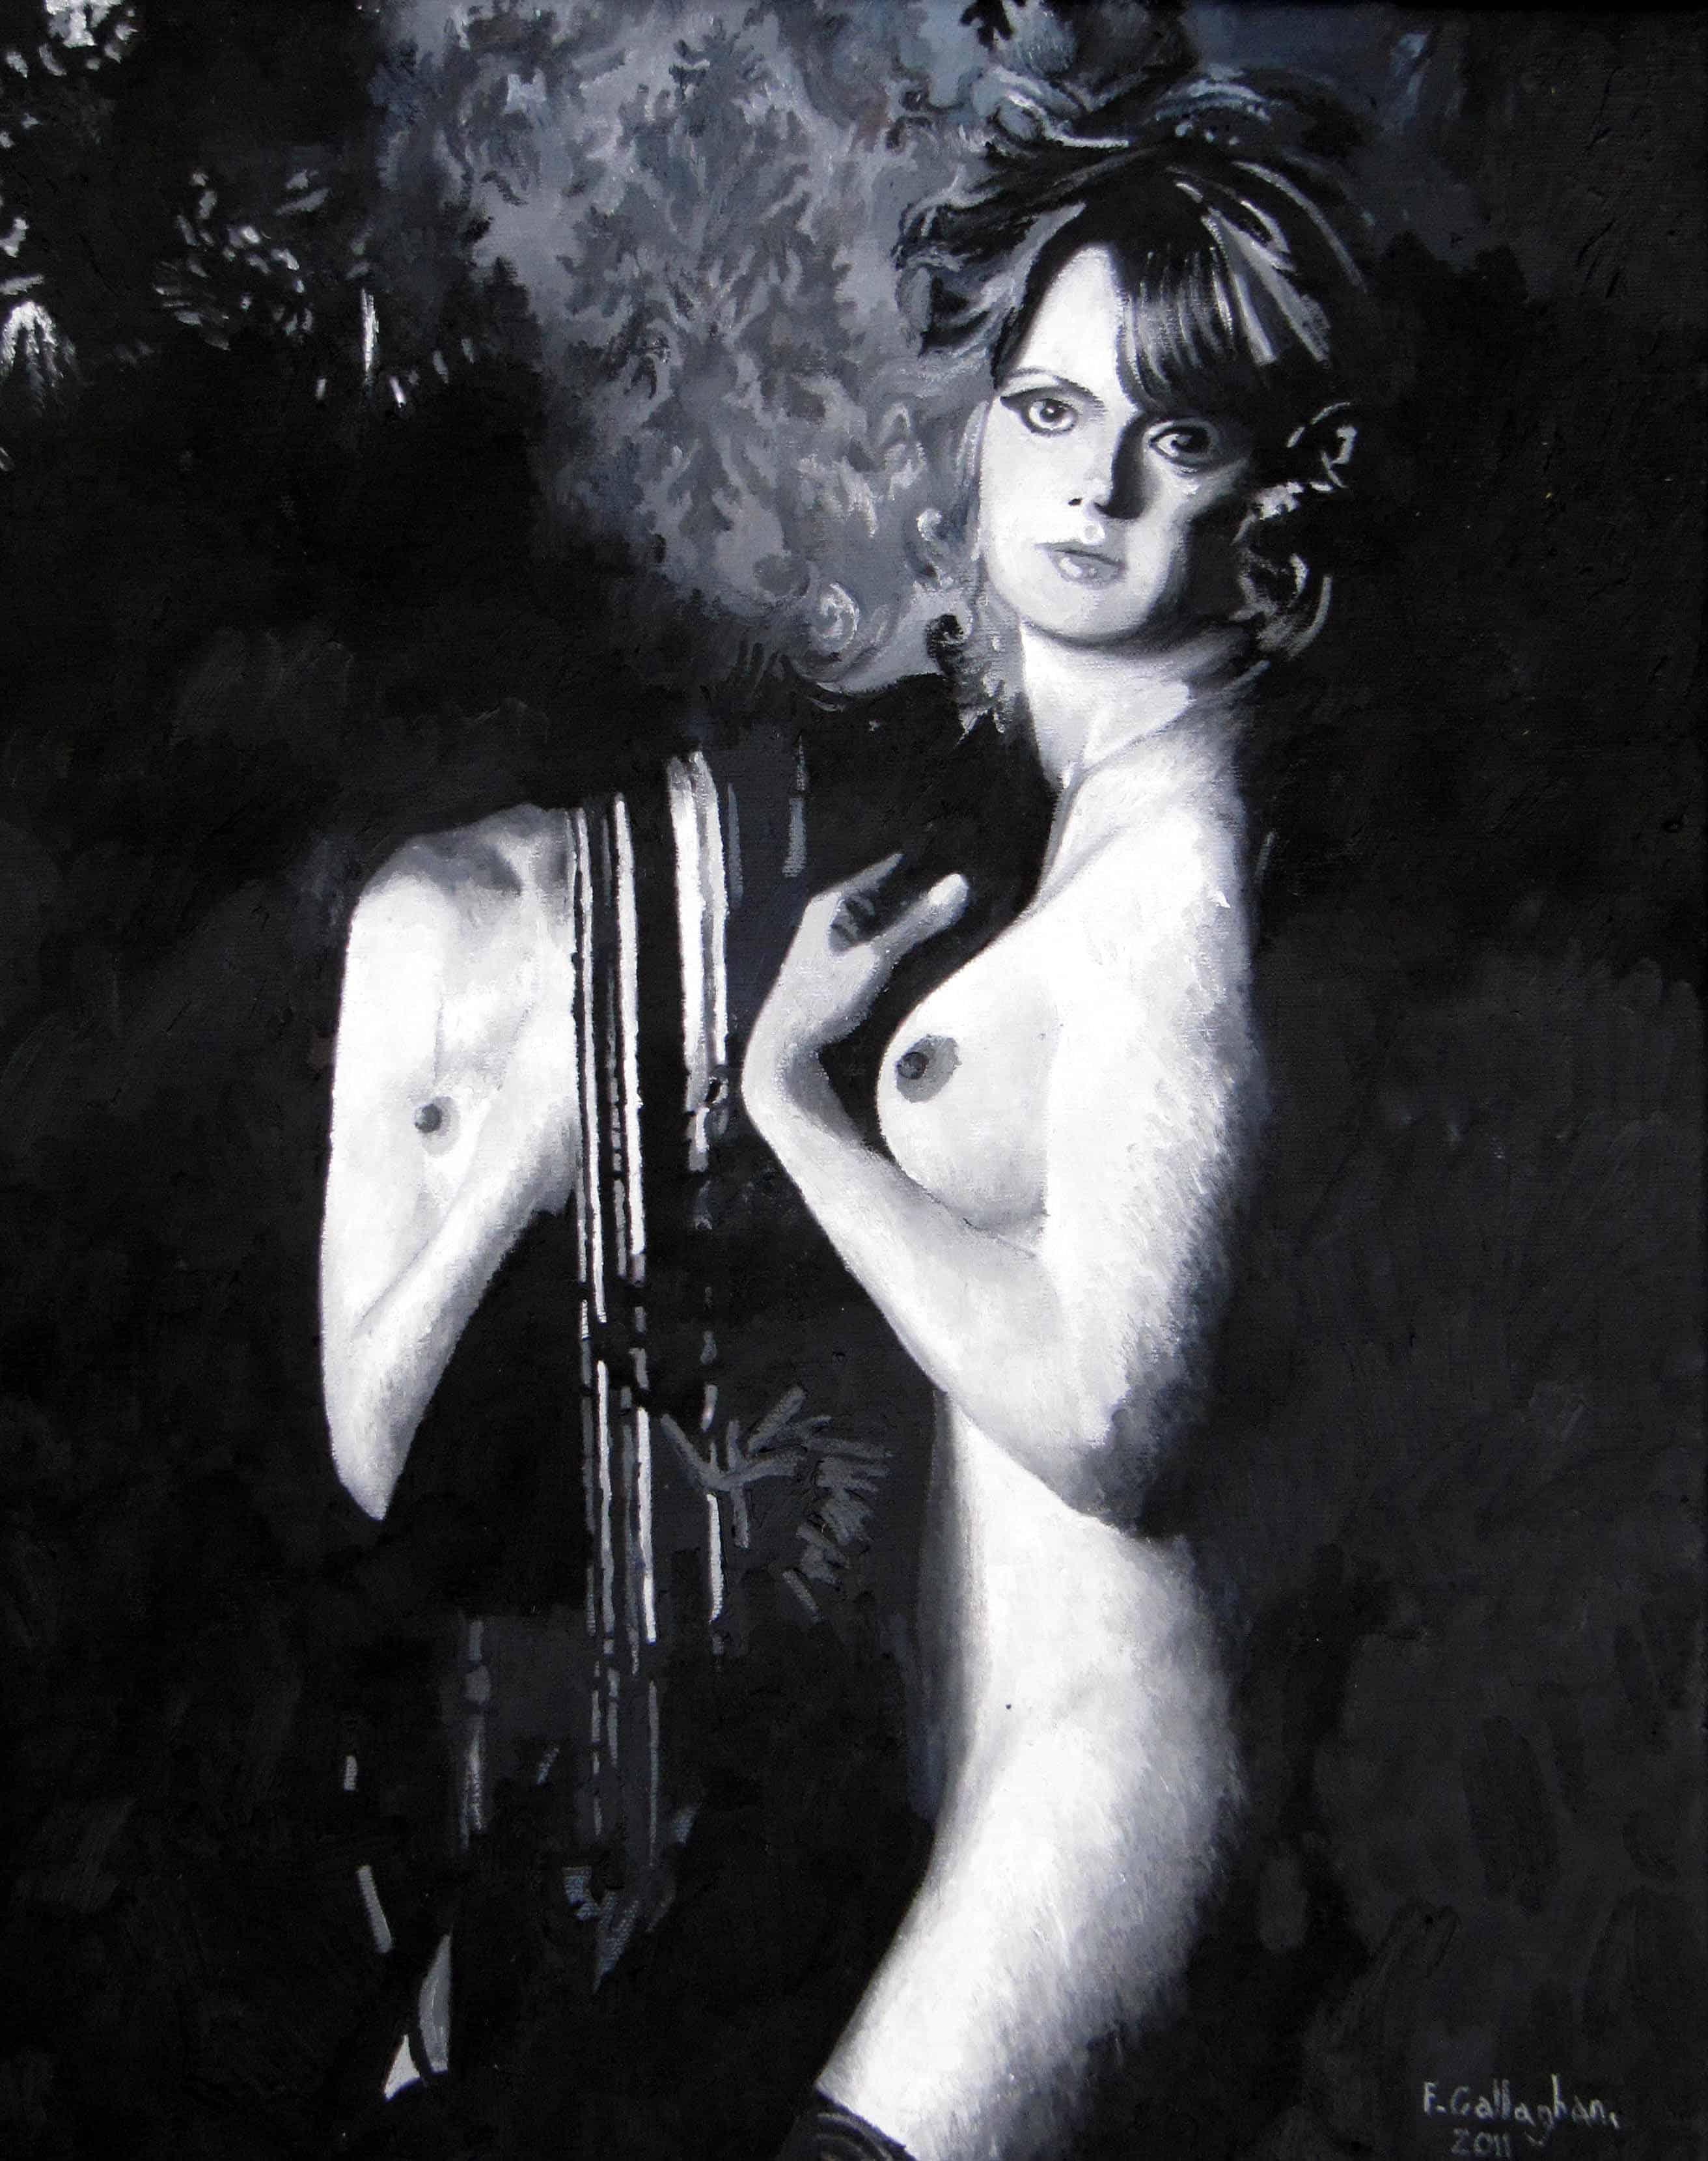 Hazel Manuel nude portrait